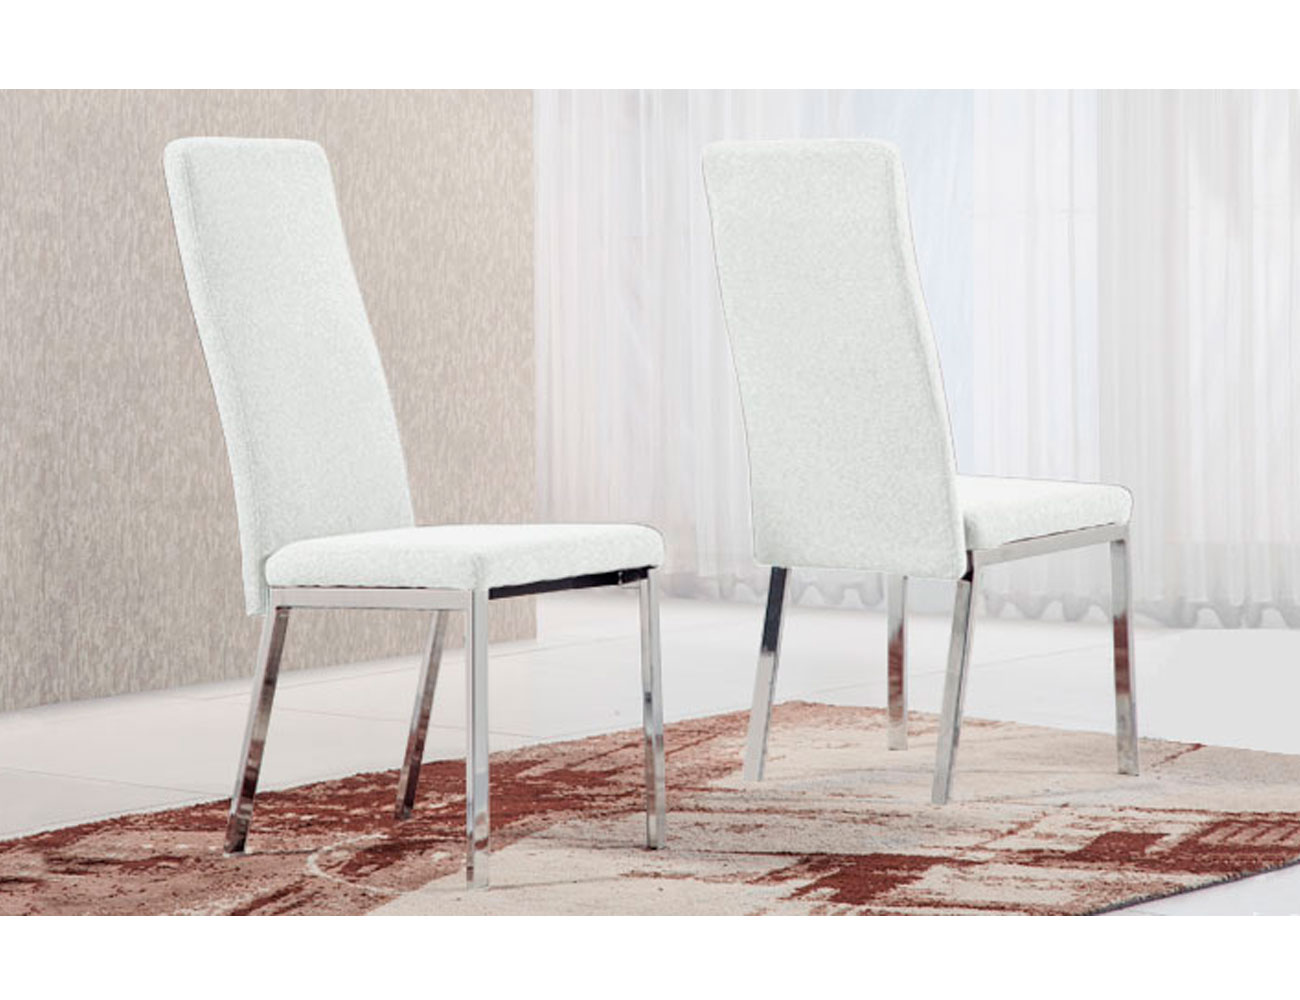 Silla tapizada cromada polipiel blanco